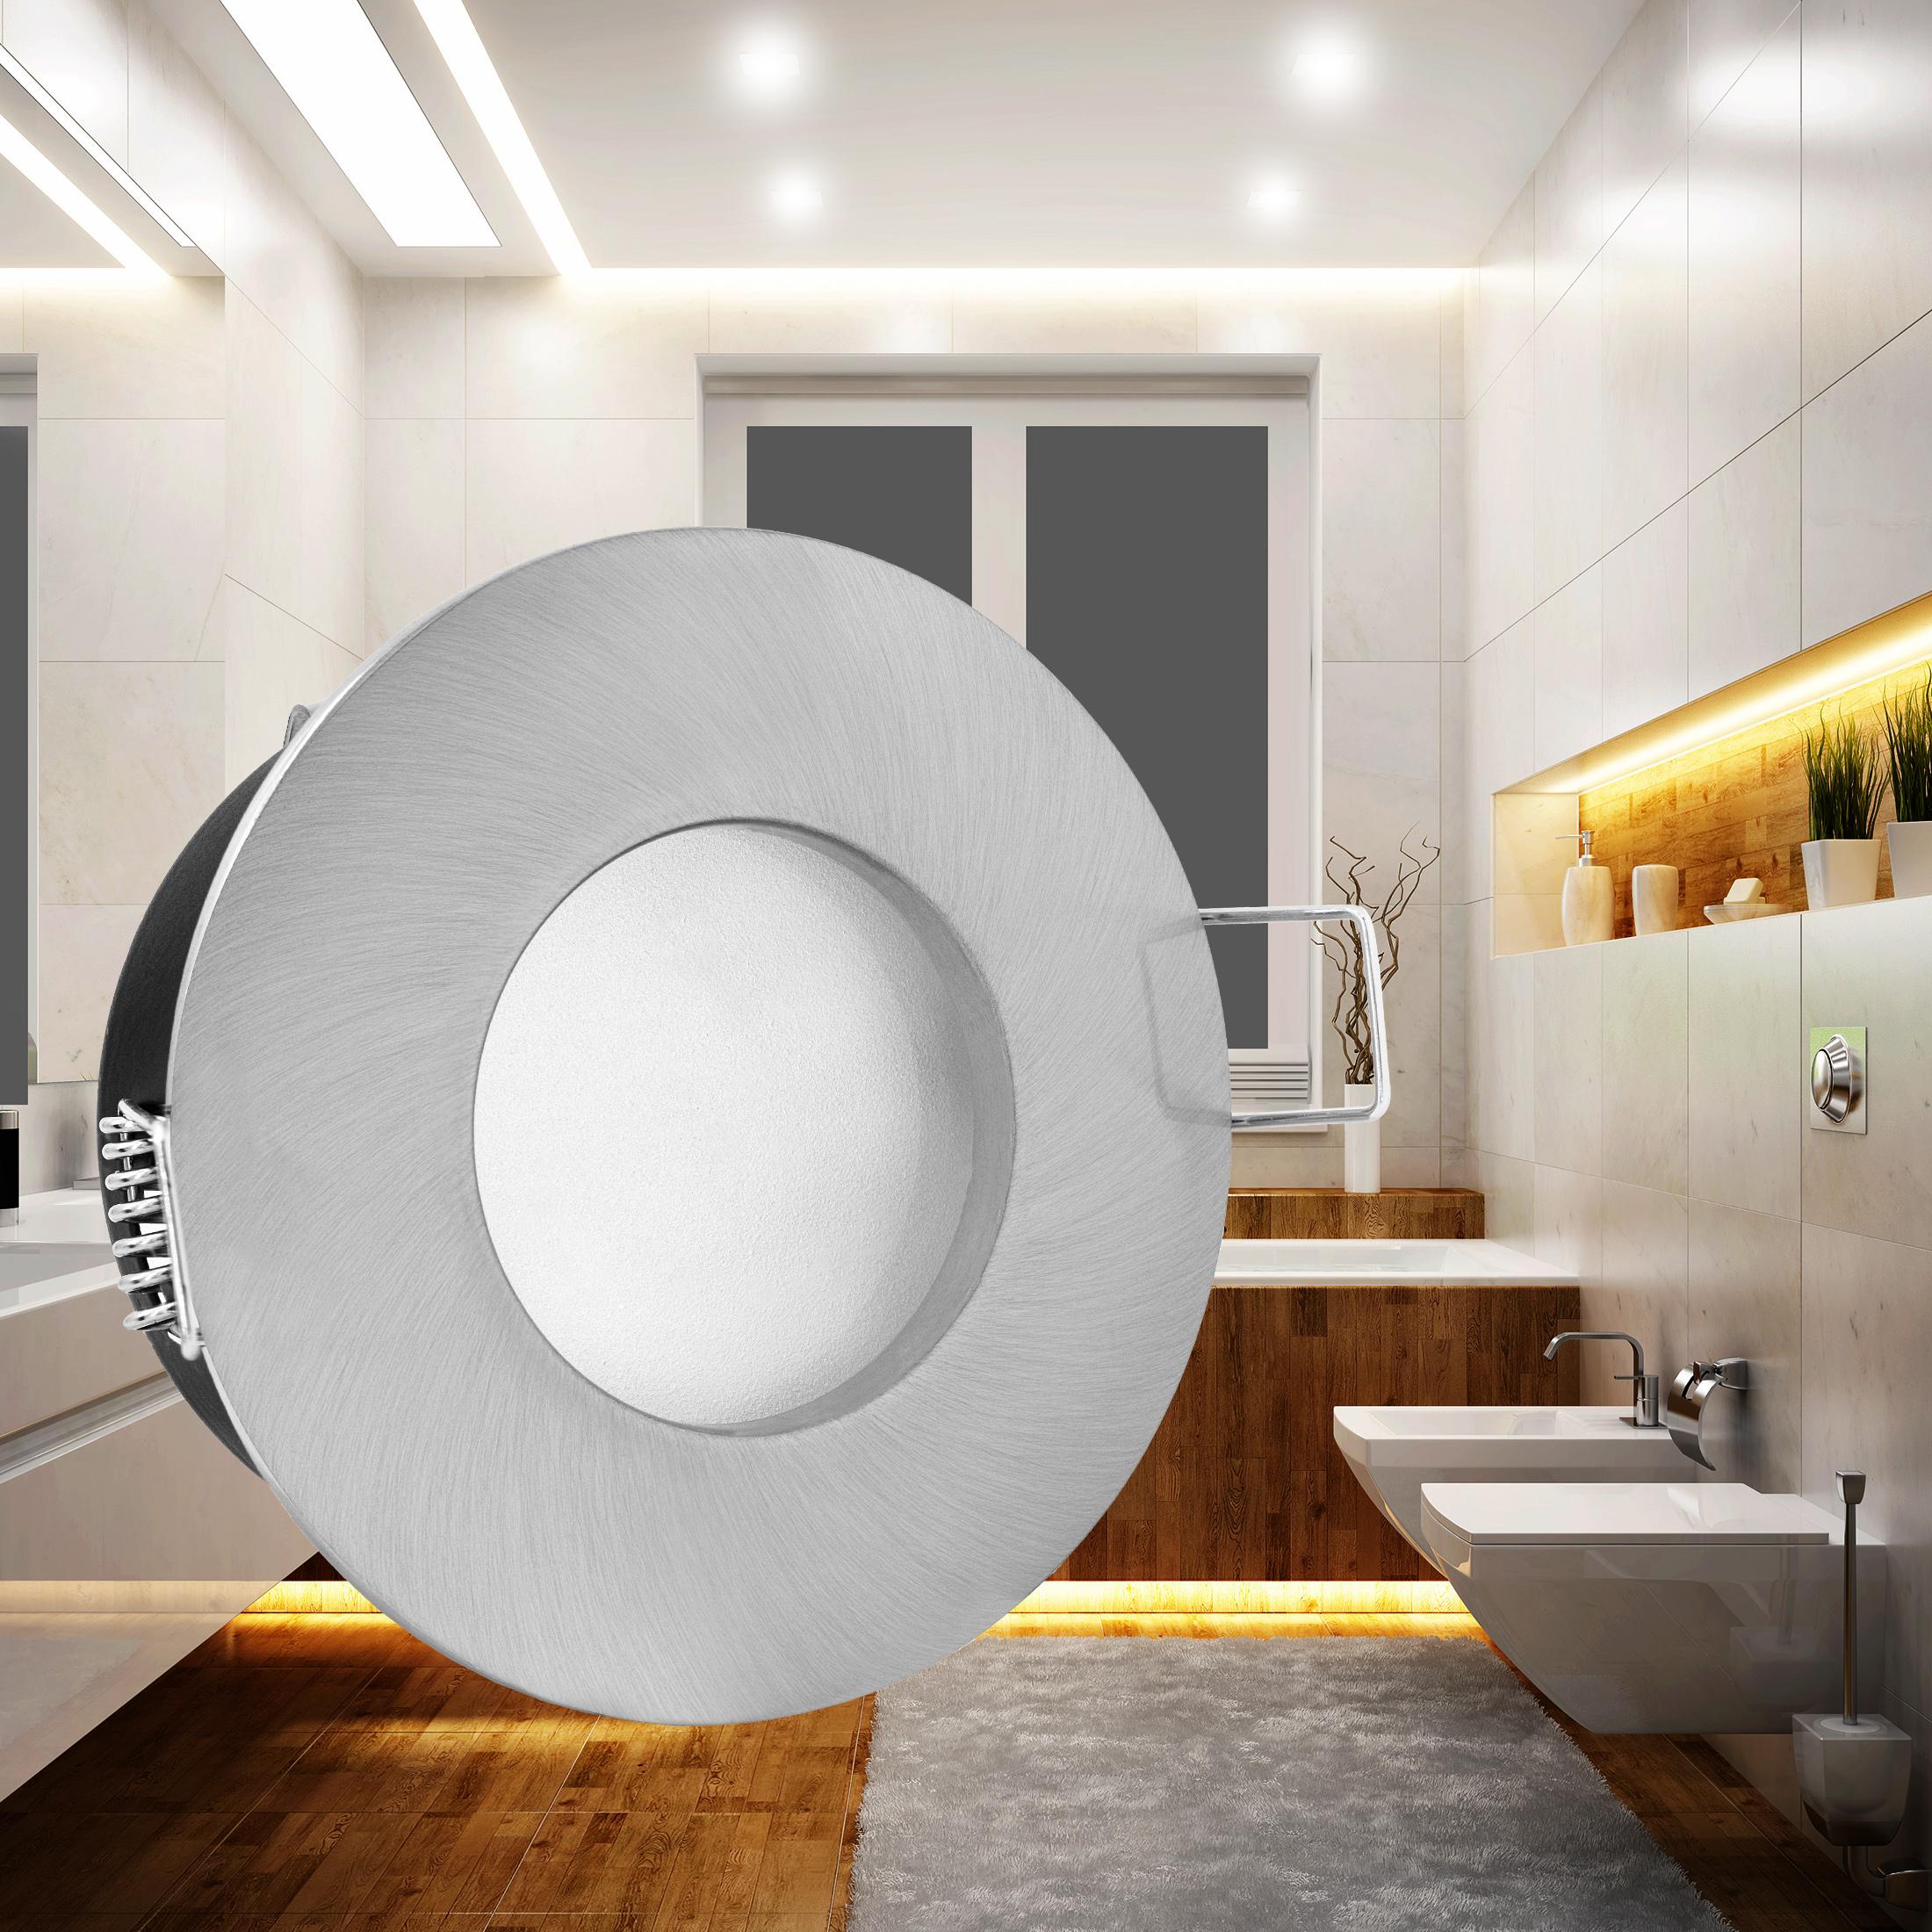 rw 1 led einbaustrahler spot bad dusche edelstahl geb rstet ip65 4 9w warmwei dimmbar gu10. Black Bedroom Furniture Sets. Home Design Ideas